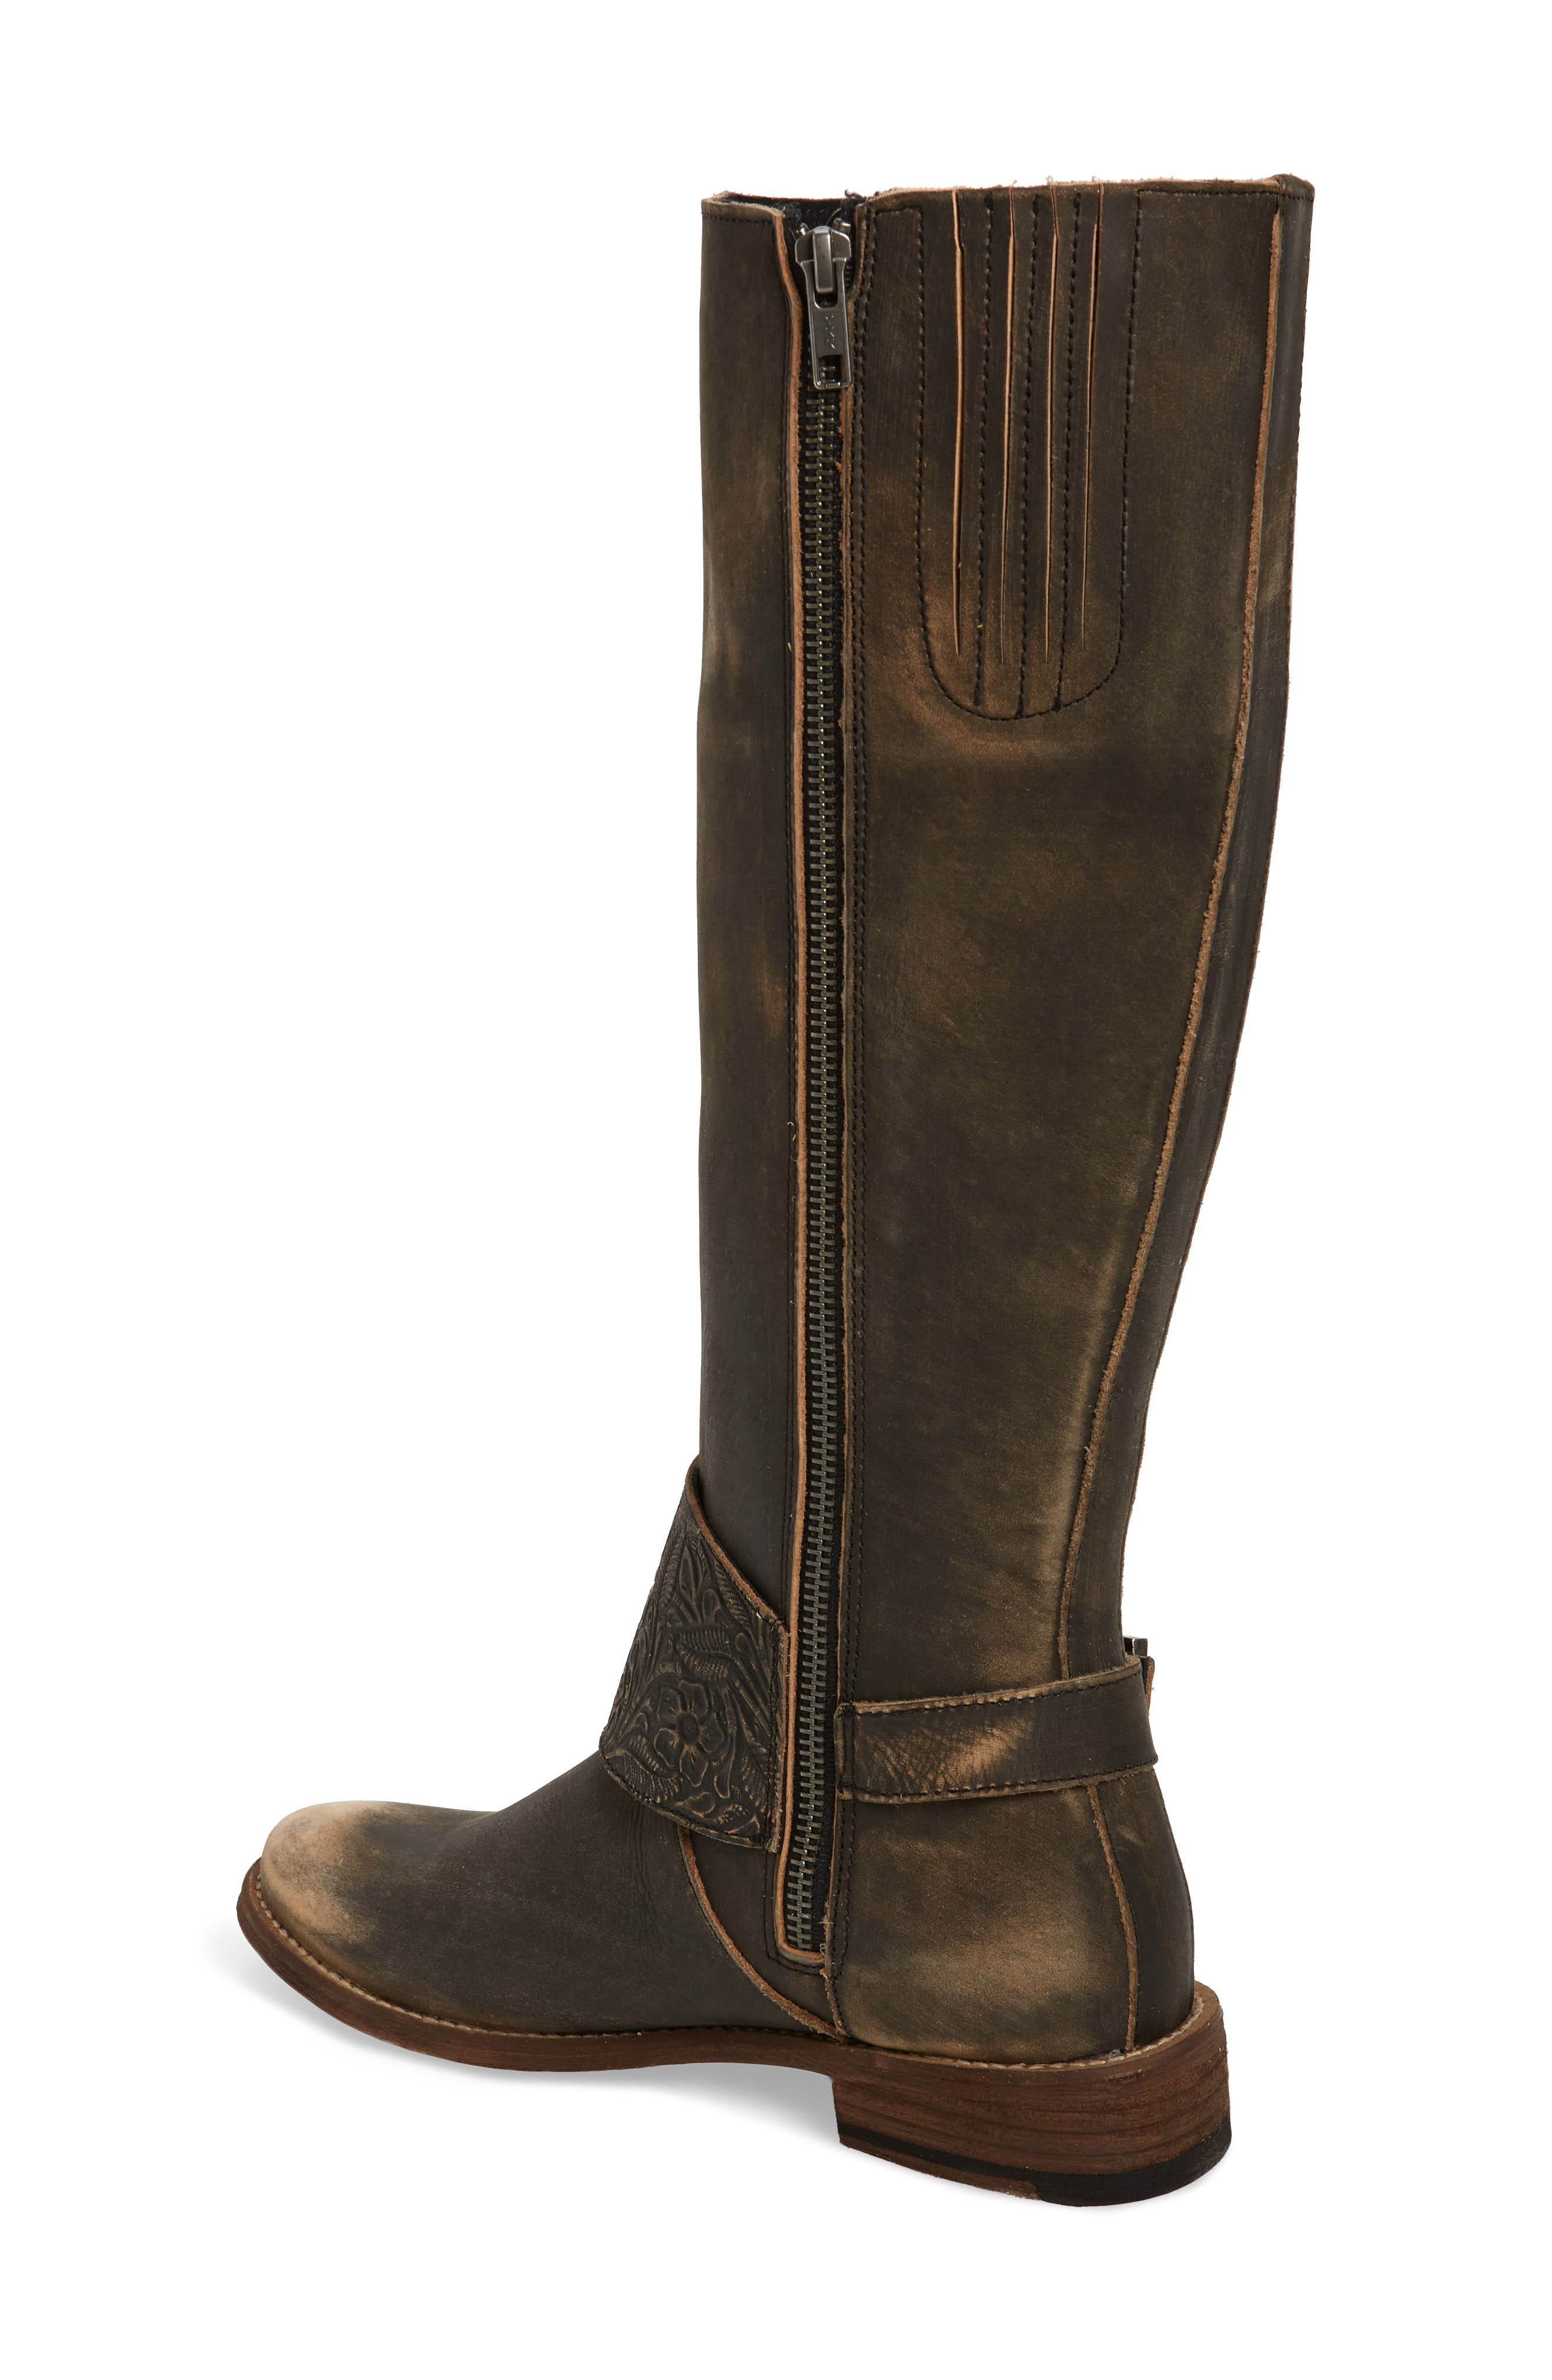 6d37e0fc19e11 Women's Very Volatile Boots | Nordstrom